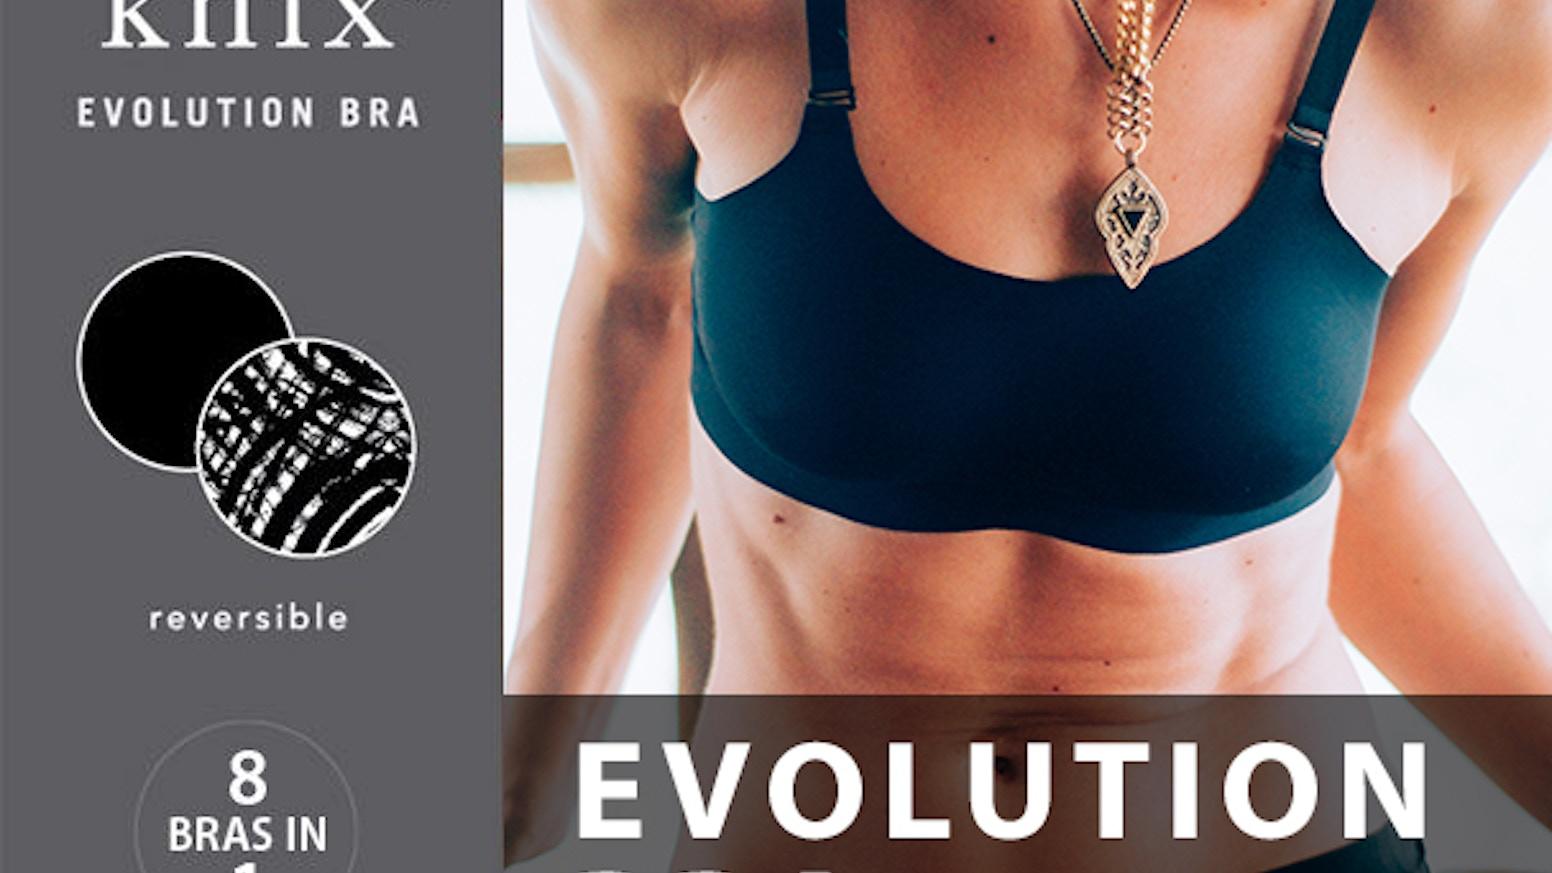 52d588200a327 8-in-1 EVOLUTION BRA  The World s Most Advanced Bra by Knix Wear ...